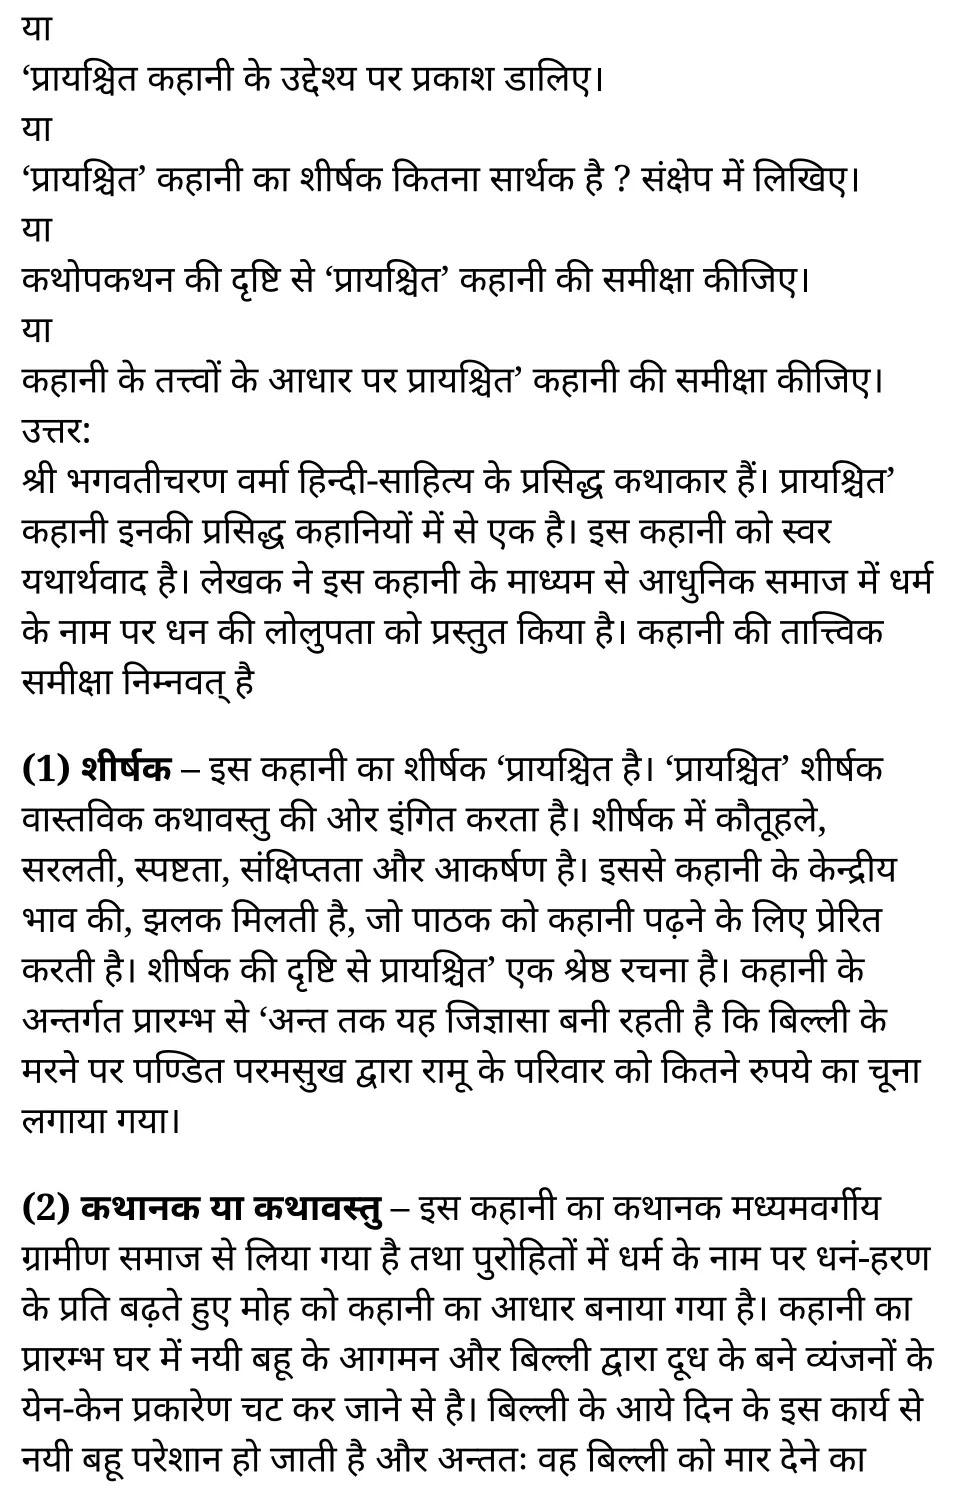 कक्षा 11 साहित्यिक हिंदी कथा-भारती अध्याय 3  के नोट्स साहित्यिक हिंदी में एनसीईआरटी समाधान,   class 11 sahityik hindi katha bharathi chapter 3,  class 11 sahityik hindi katha bharathi chapter 3 ncert solutions in sahityik hindi,  class 11 sahityik hindi katha bharathi chapter 3 notes in sahityik hindi,  class 11 sahityik hindi katha bharathi chapter 3 question answer,  class 11 sahityik hindi katha bharathi chapter 3 notes,  11   class katha bharathi chapter 3 katha bharathi chapter 3 in sahityik hindi,  class 11 sahityik hindi katha bharathi chapter 3 in sahityik hindi,  class 11 sahityik hindi katha bharathi chapter 3 important questions in sahityik hindi,  class 11 sahityik hindi  chapter 3 notes in sahityik hindi,  class 11 sahityik hindi katha bharathi chapter 3 test,  class 11 sahityik hindi  chapter 1katha bharathi chapter 3 pdf,  class 11 sahityik hindi katha bharathi chapter 3 notes pdf,  class 11 sahityik hindi katha bharathi chapter 3 exercise solutions,  class 11 sahityik hindi katha bharathi chapter 3, class 11 sahityik hindi katha bharathi chapter 3 notes study rankers,  class 11 sahityik hindi katha bharathi chapter 3 notes,  class 11 sahityik hindi  chapter 3 notes,   katha bharathi chapter 3  class 11  notes pdf,  katha bharathi chapter 3 class 11  notes  ncert,   katha bharathi chapter 3 class 11 pdf,    katha bharathi chapter 3  book,     katha bharathi chapter 3 quiz class 11  ,       11  th katha bharathi chapter 3    book up board,       up board 11  th katha bharathi chapter 3 notes,  कक्षा 11 साहित्यिक हिंदी कथा-भारती अध्याय 3 , कक्षा 11 साहित्यिक हिंदी का कथा-भारती, कक्षा 11 साहित्यिक हिंदी के कथा-भारती अध्याय 3  के नोट्स साहित्यिक हिंदी में, कक्षा 11 का साहित्यिक हिंदीकथा-भारती अध्याय 3 का प्रश्न उत्तर, कक्षा 11 साहित्यिक हिंदी कथा-भारती अध्याय 3 के नोट्स, 11 कक्षा साहित्यिक हिंदी कथा-भारती अध्याय 3   साहित्यिक हिंदी में,कक्षा 11 साहित्यिक हिंदी कथा-भारती अध्याय 3  साहित्यिक हिंदी में, कक्षा 11 साहित्यिक हिंदी कथा-भारती अध्याय 3  महत्वपूर्ण